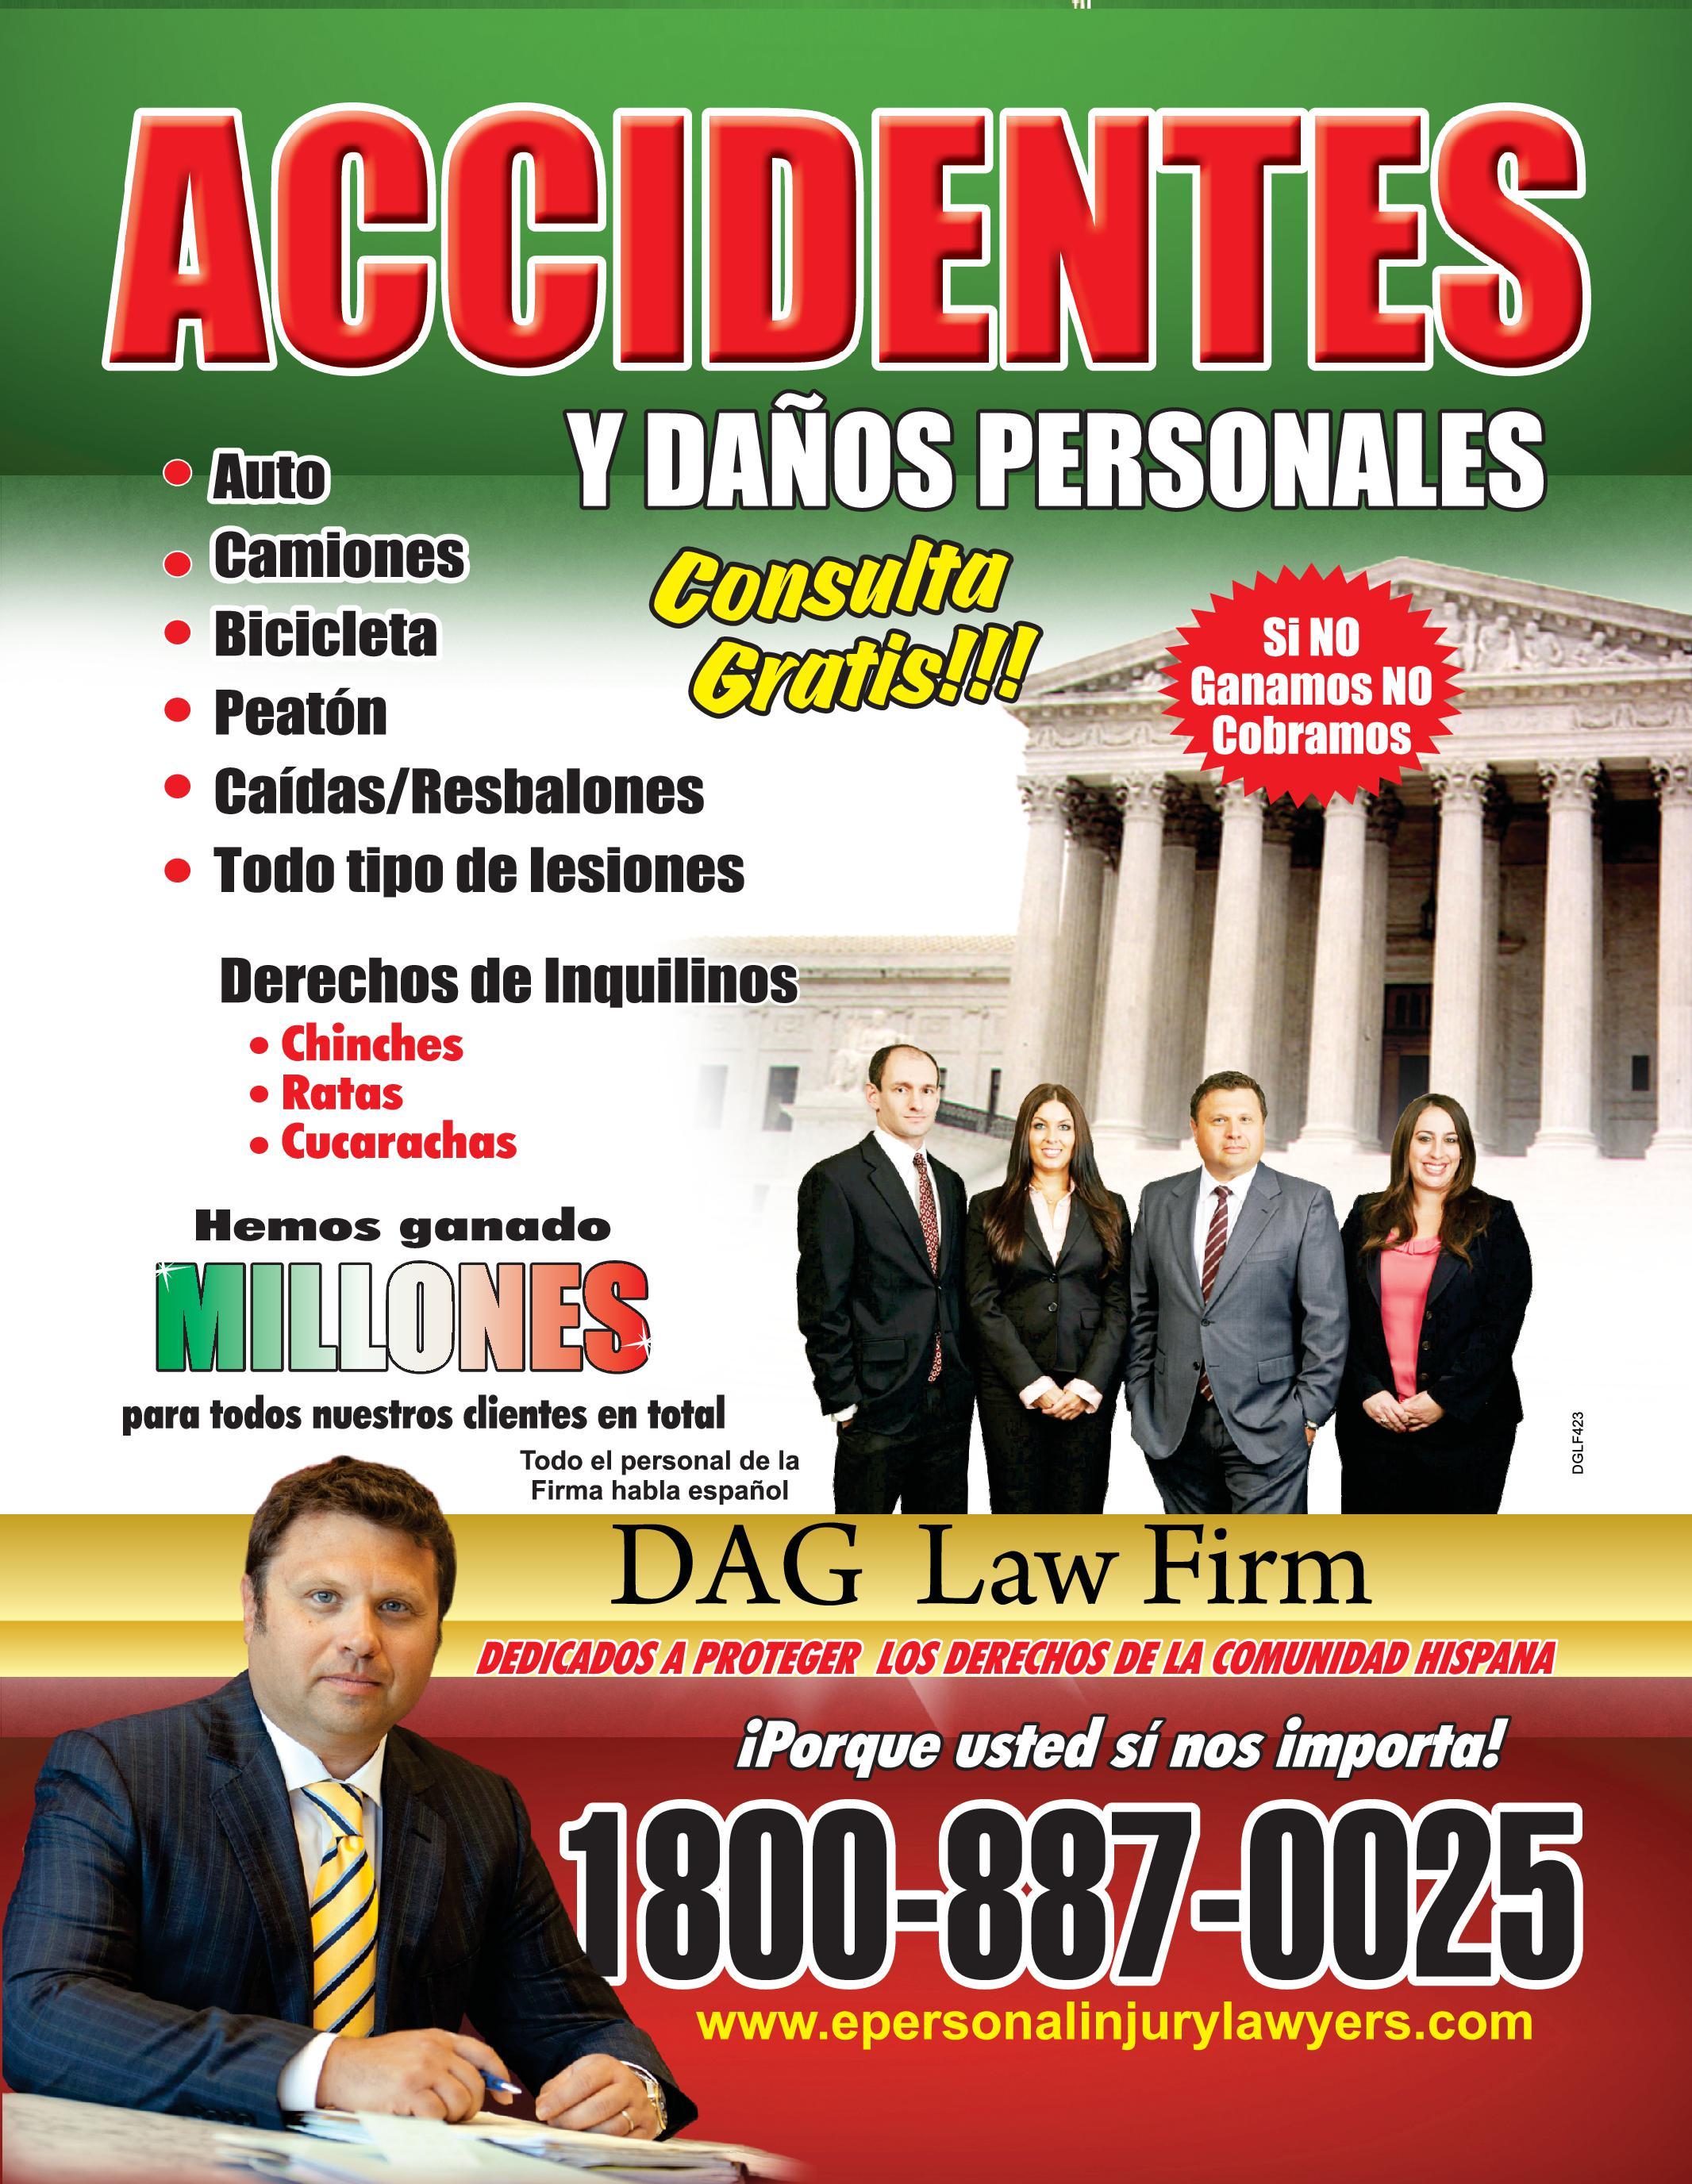 Dag Law Firm